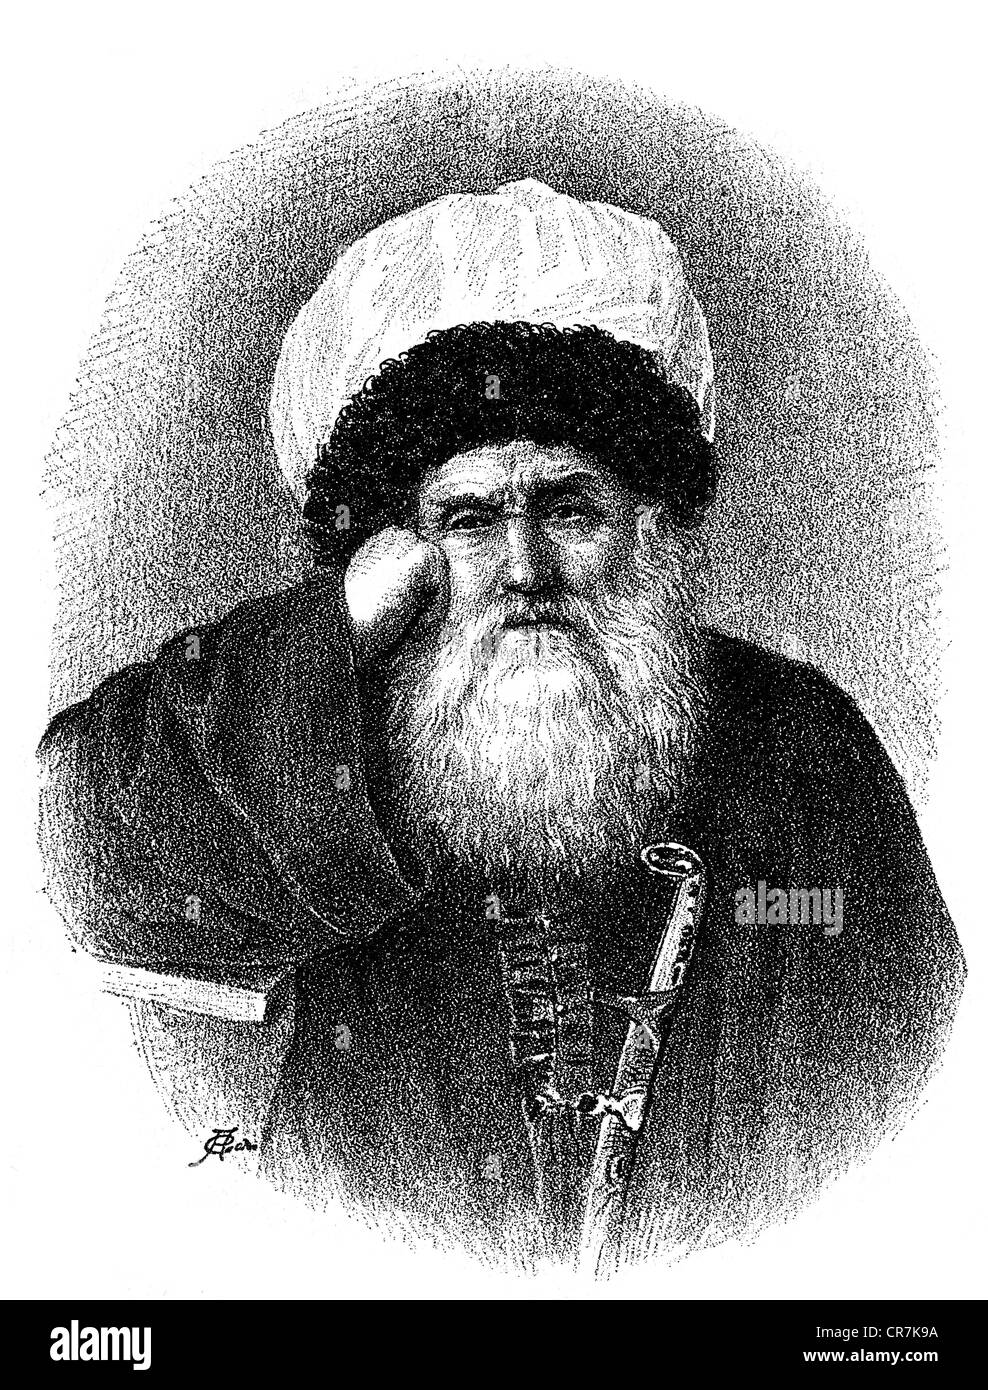 Shamil ben Muhammad, circa 1797 - March 1871, Islamic scholar, portrait, wood engraving, 19th century, Additional - Stock Image